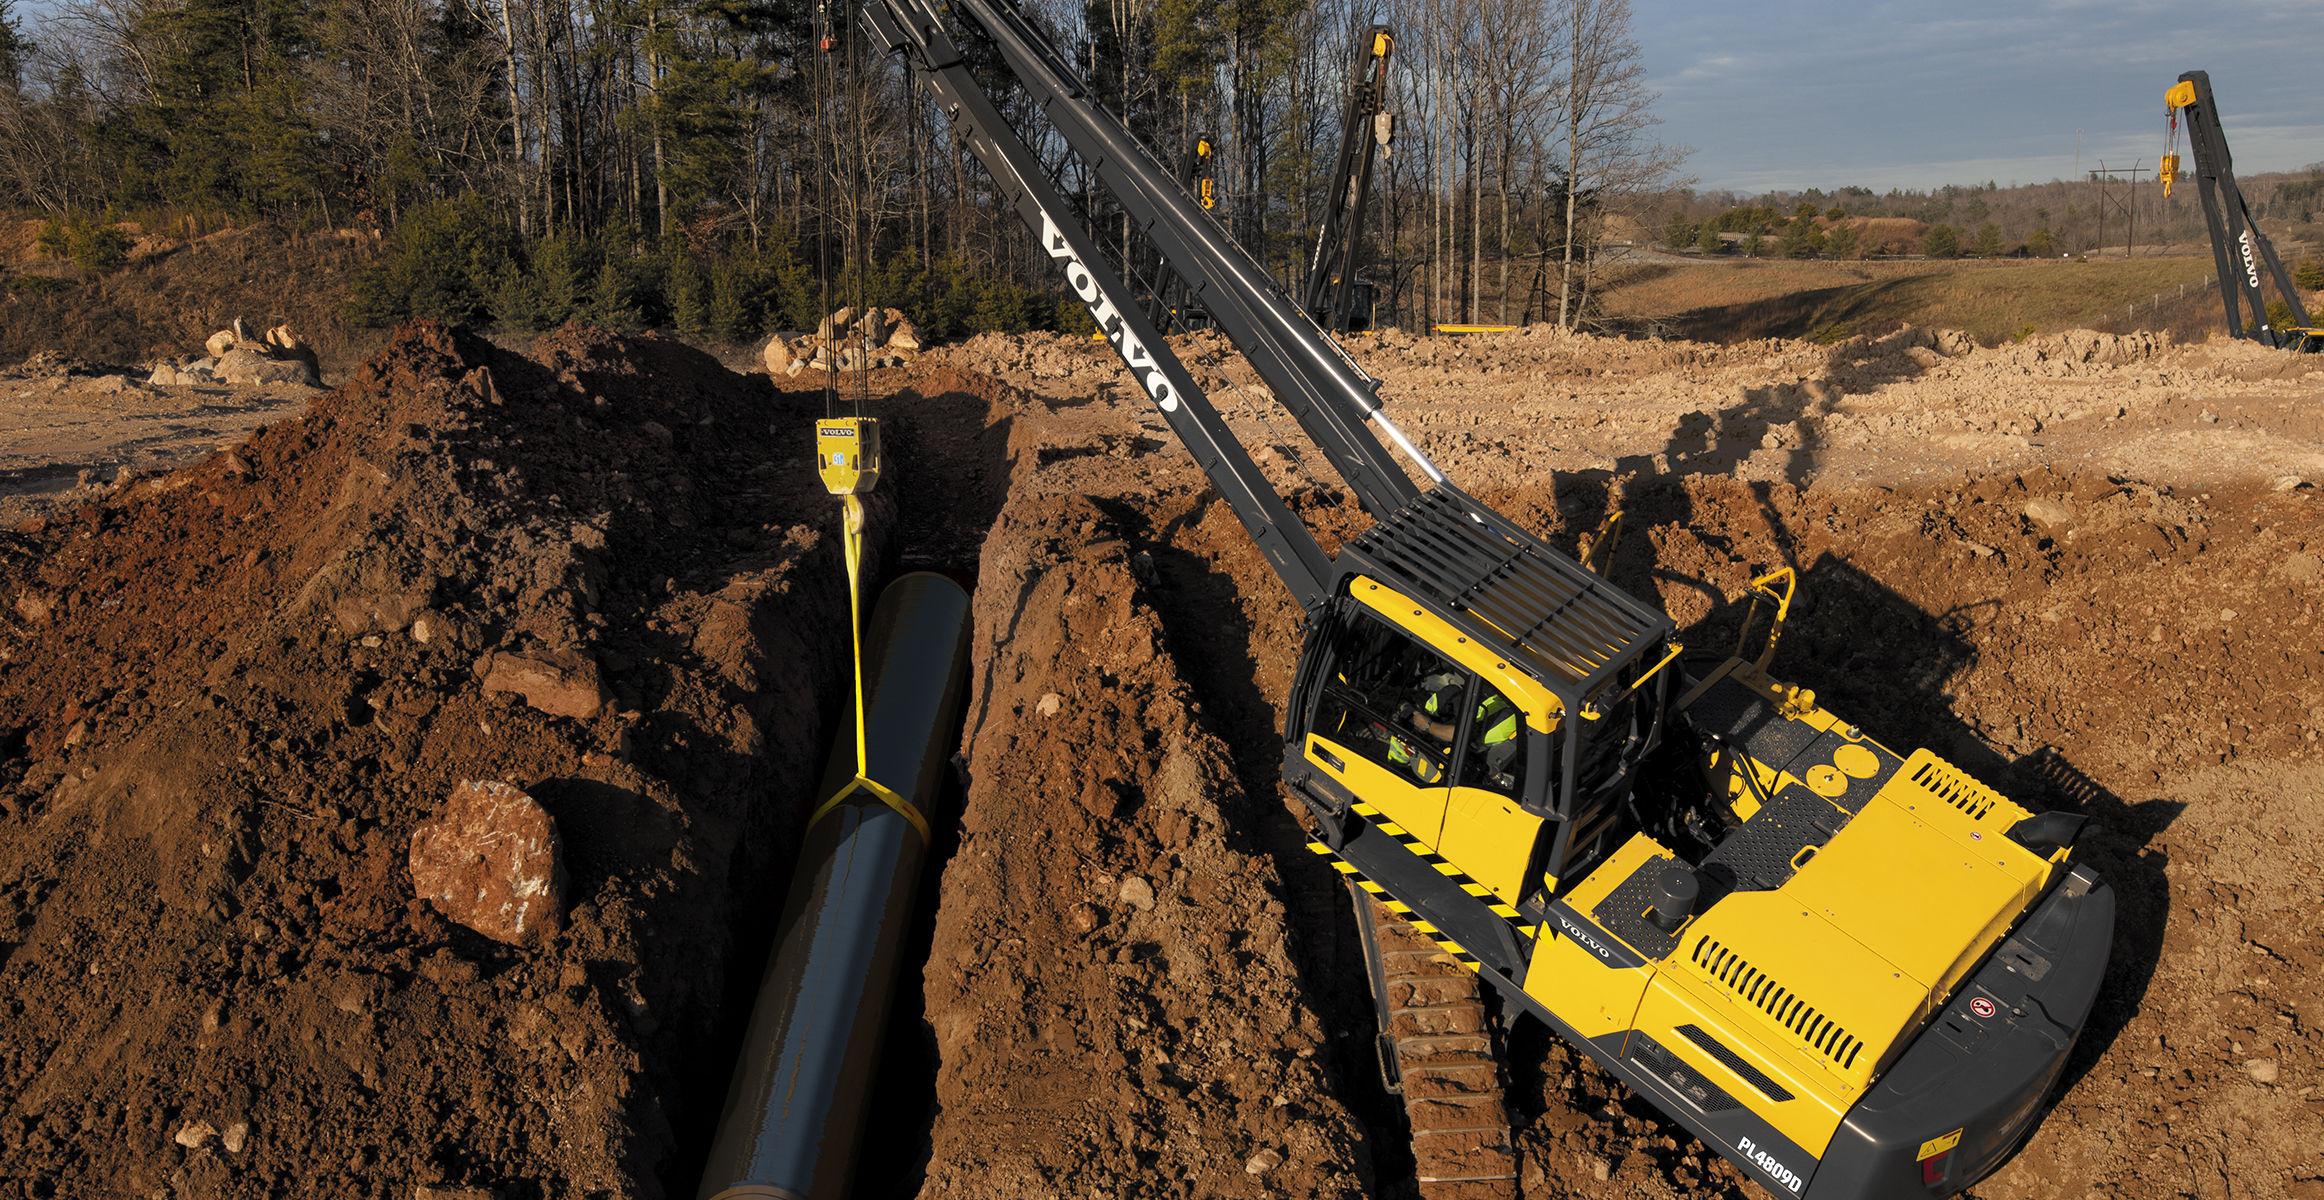 volvo pipeliner posatubi x condutture Volvo-benefits-pipelayer-pl4809d-t4i-lms-2324x1200